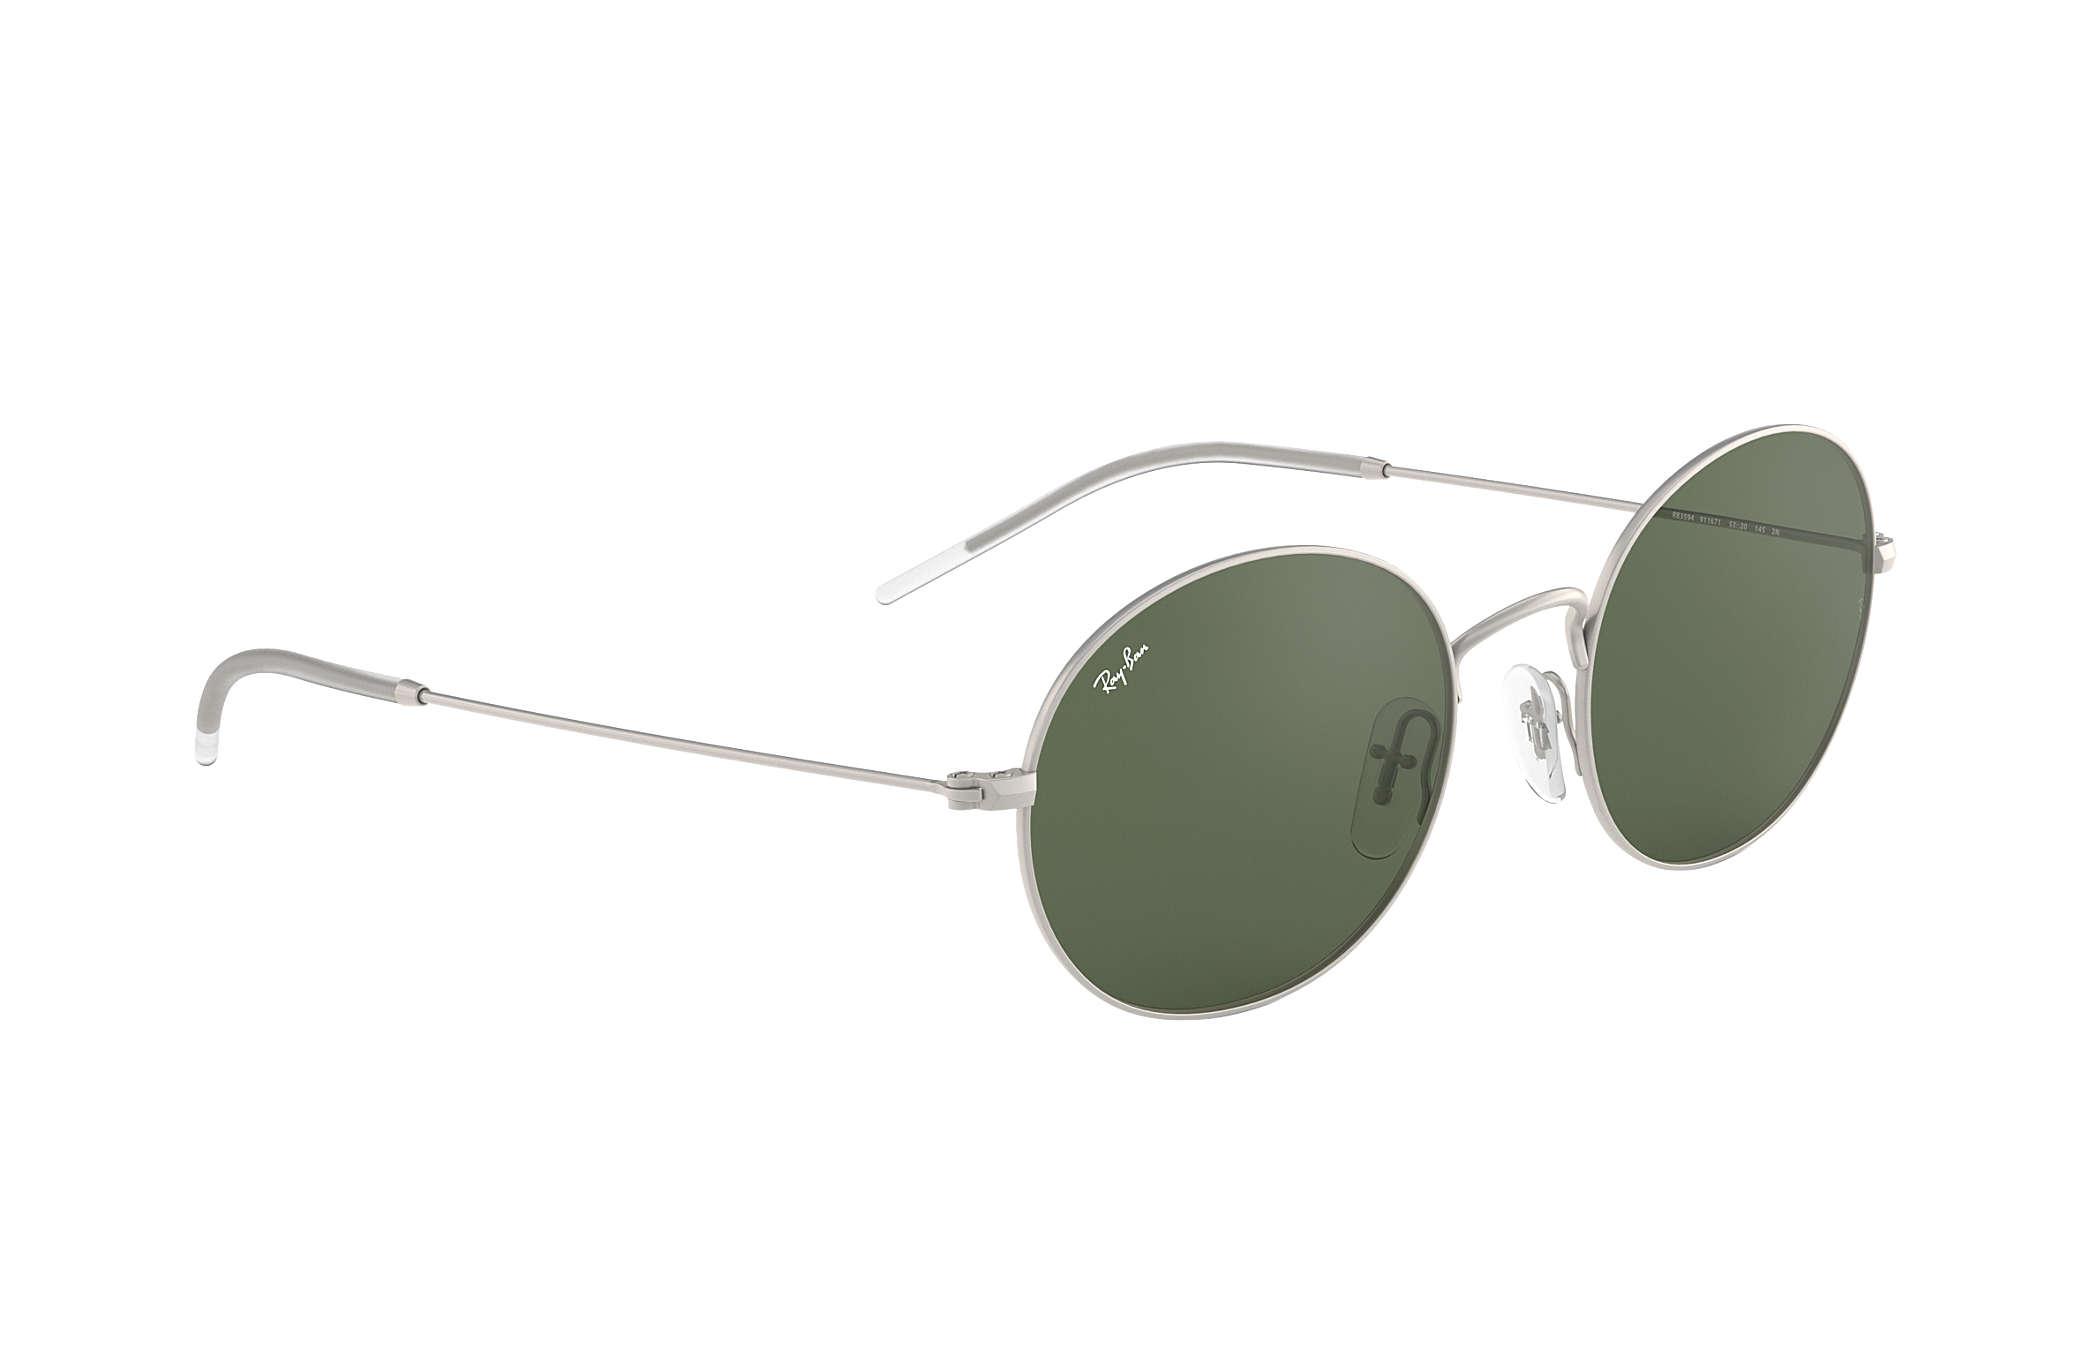 8045d8e0049ca Ray-Ban Ray-ban Beat RB3594 Silver - Metal - Green Lenses ...